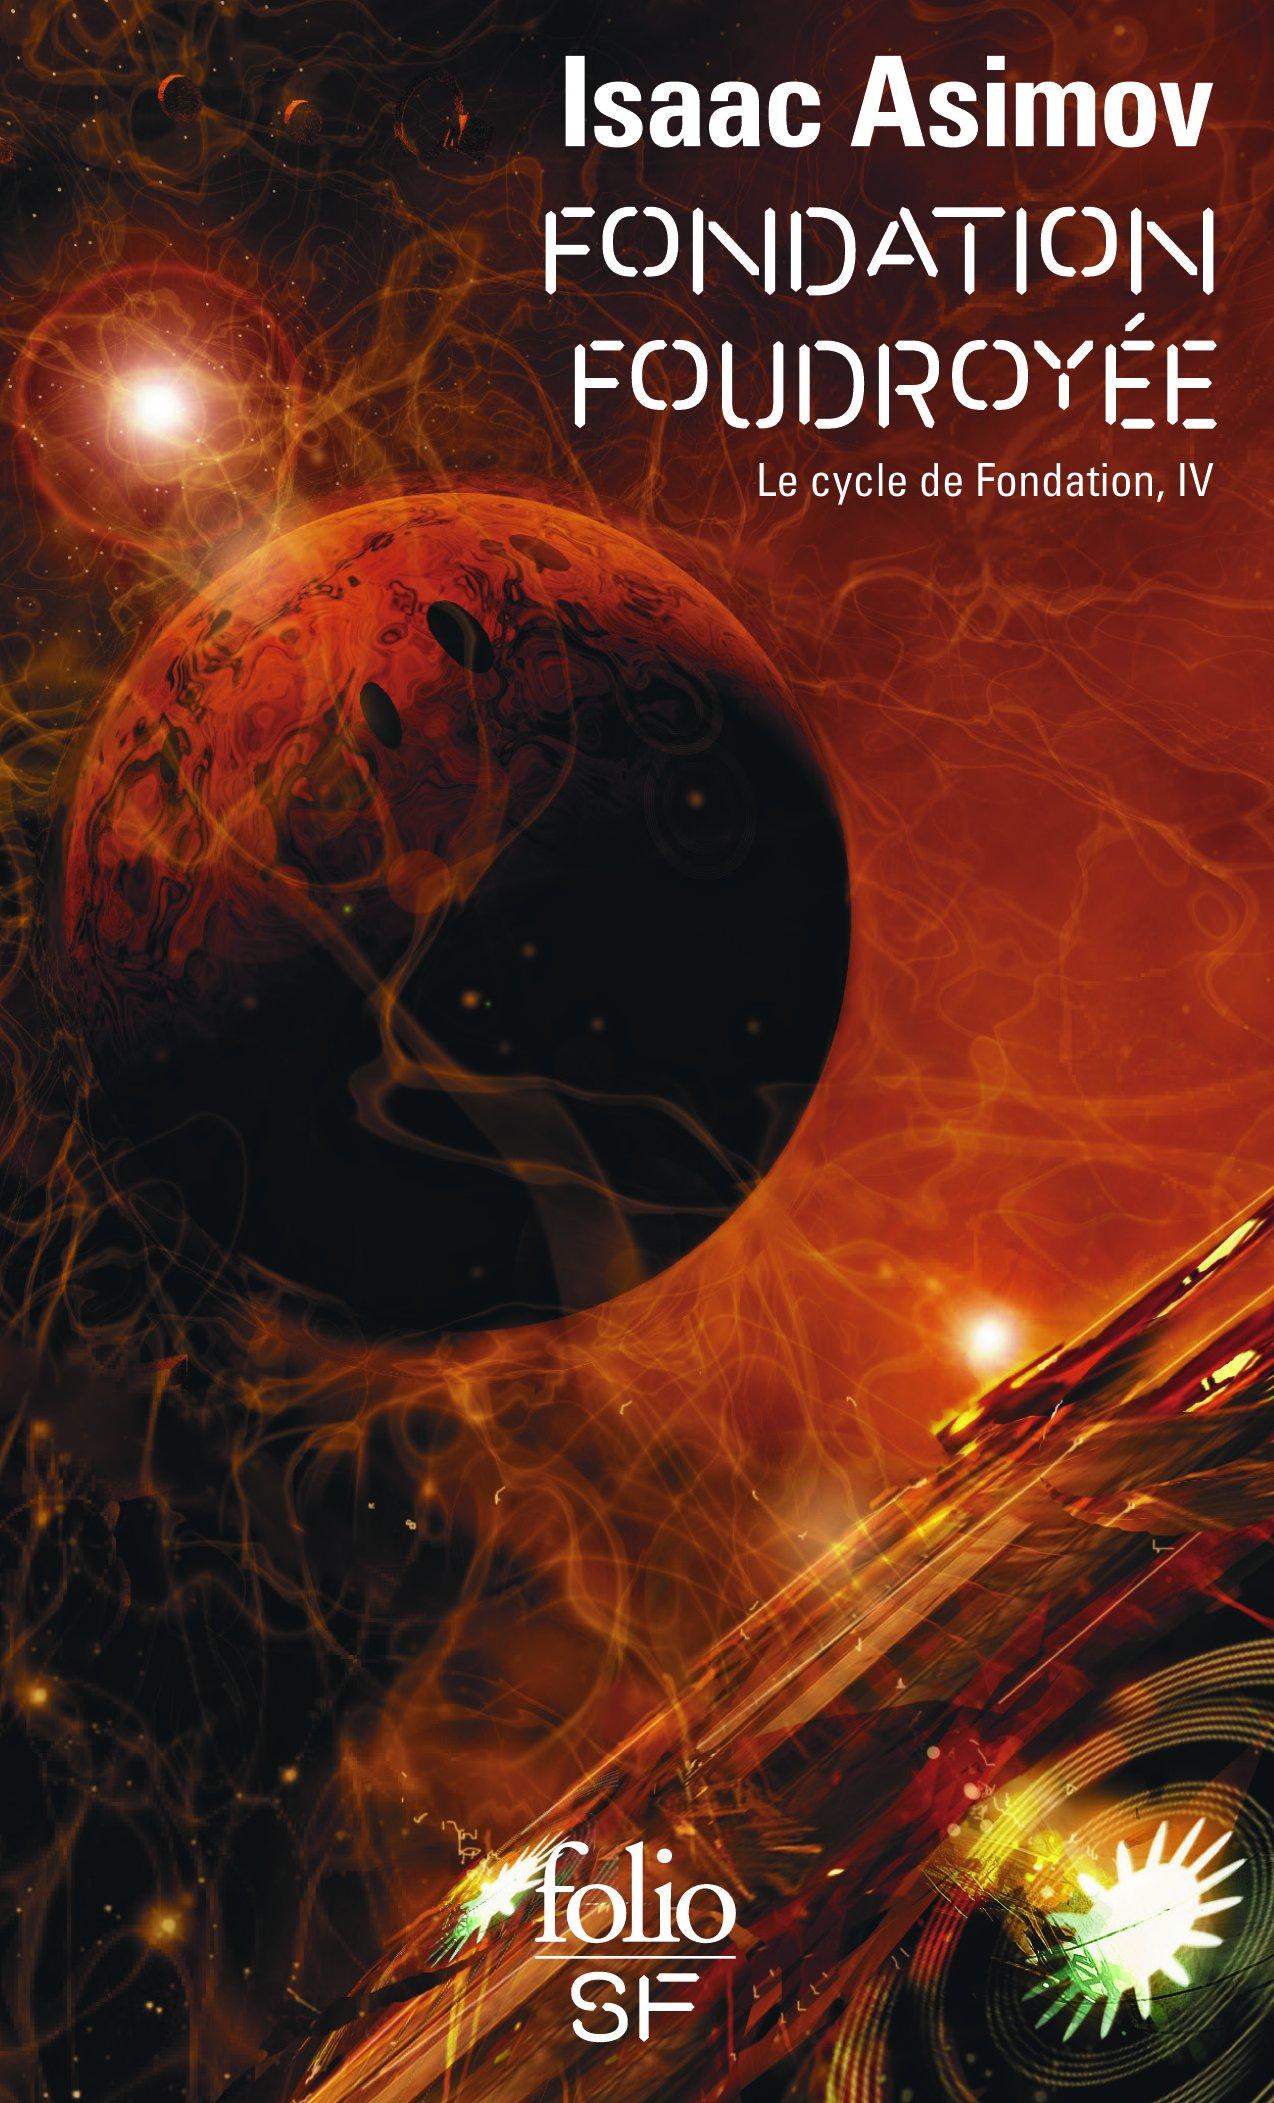 Le cycle de Fondation, IV:Fondation foudroyée (Anglais) Poche – 26 mars 2009 Isaac Asimov Jean Bonnefoy Folio 2070360636